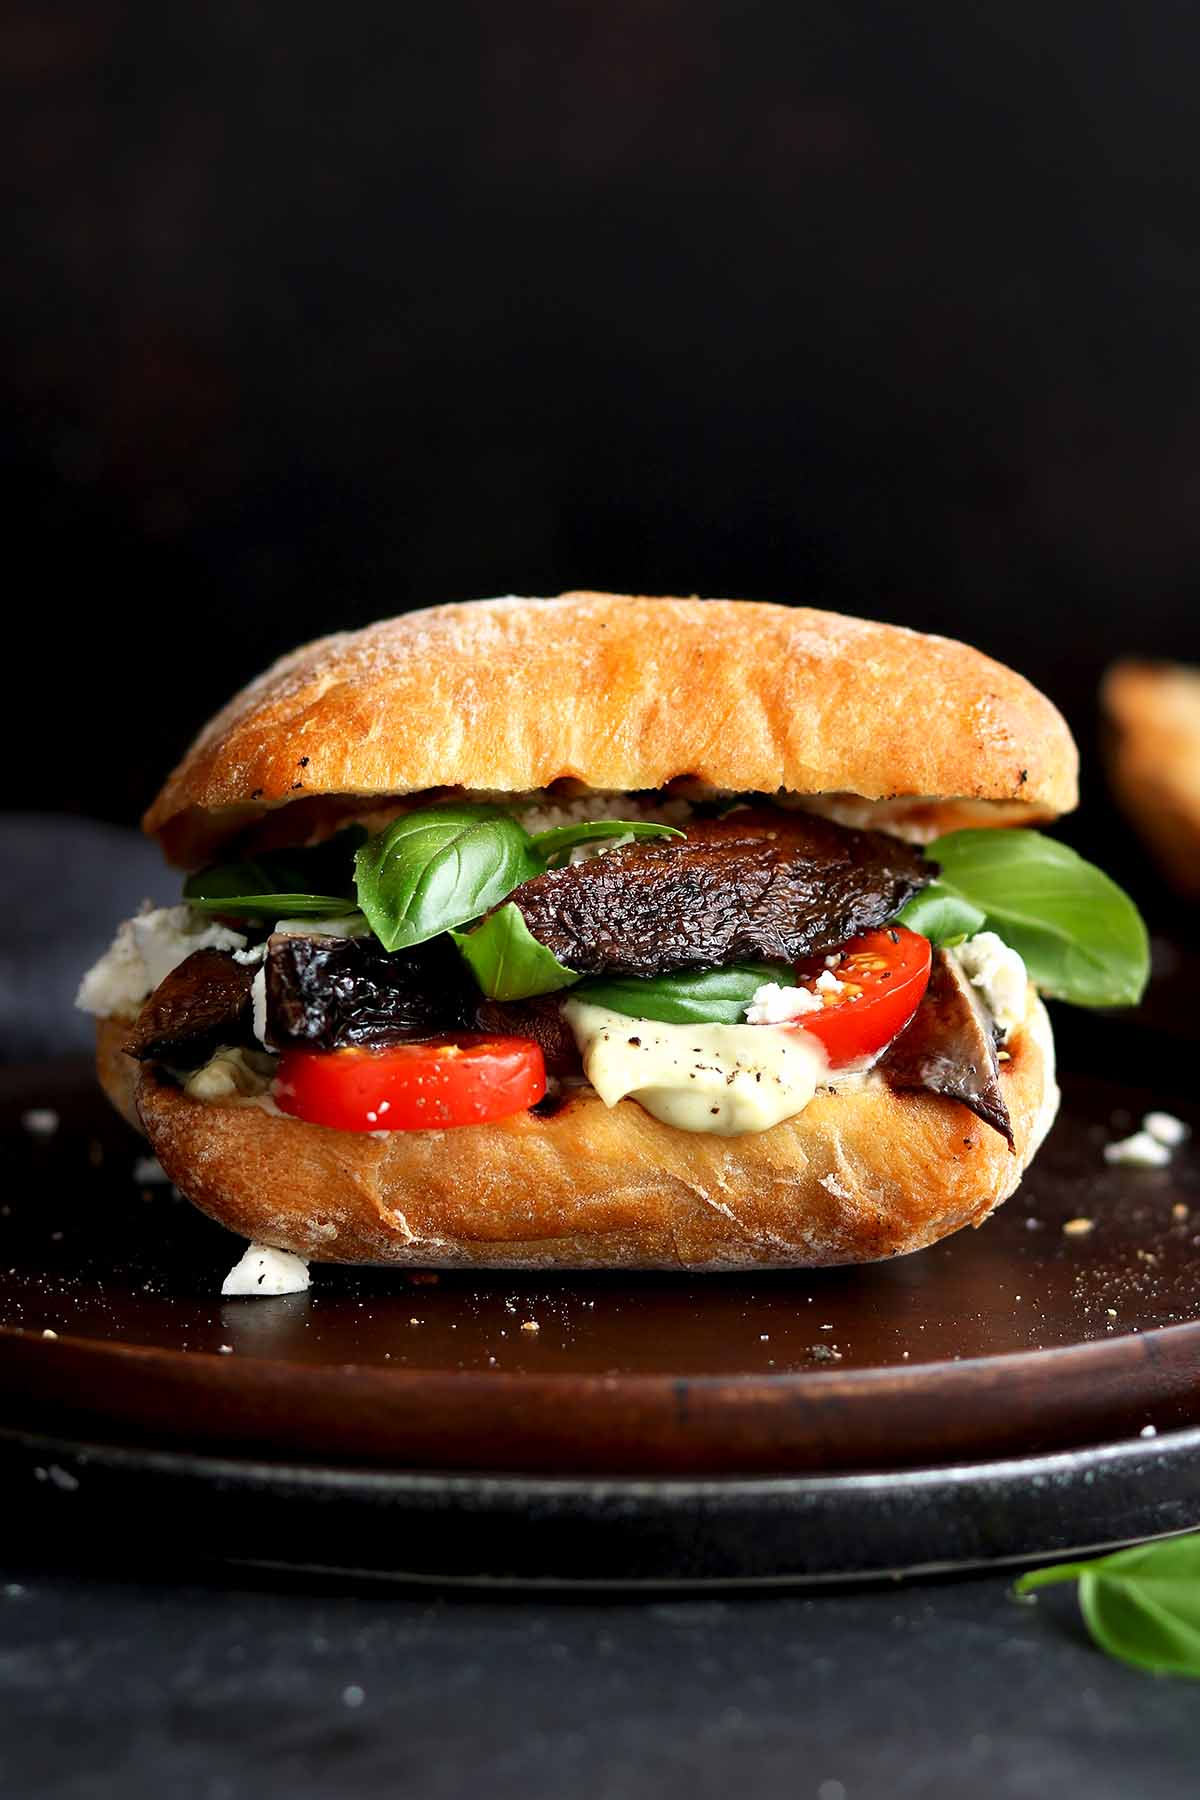 Portobello Mushroom Sandwich The Last Food Blog